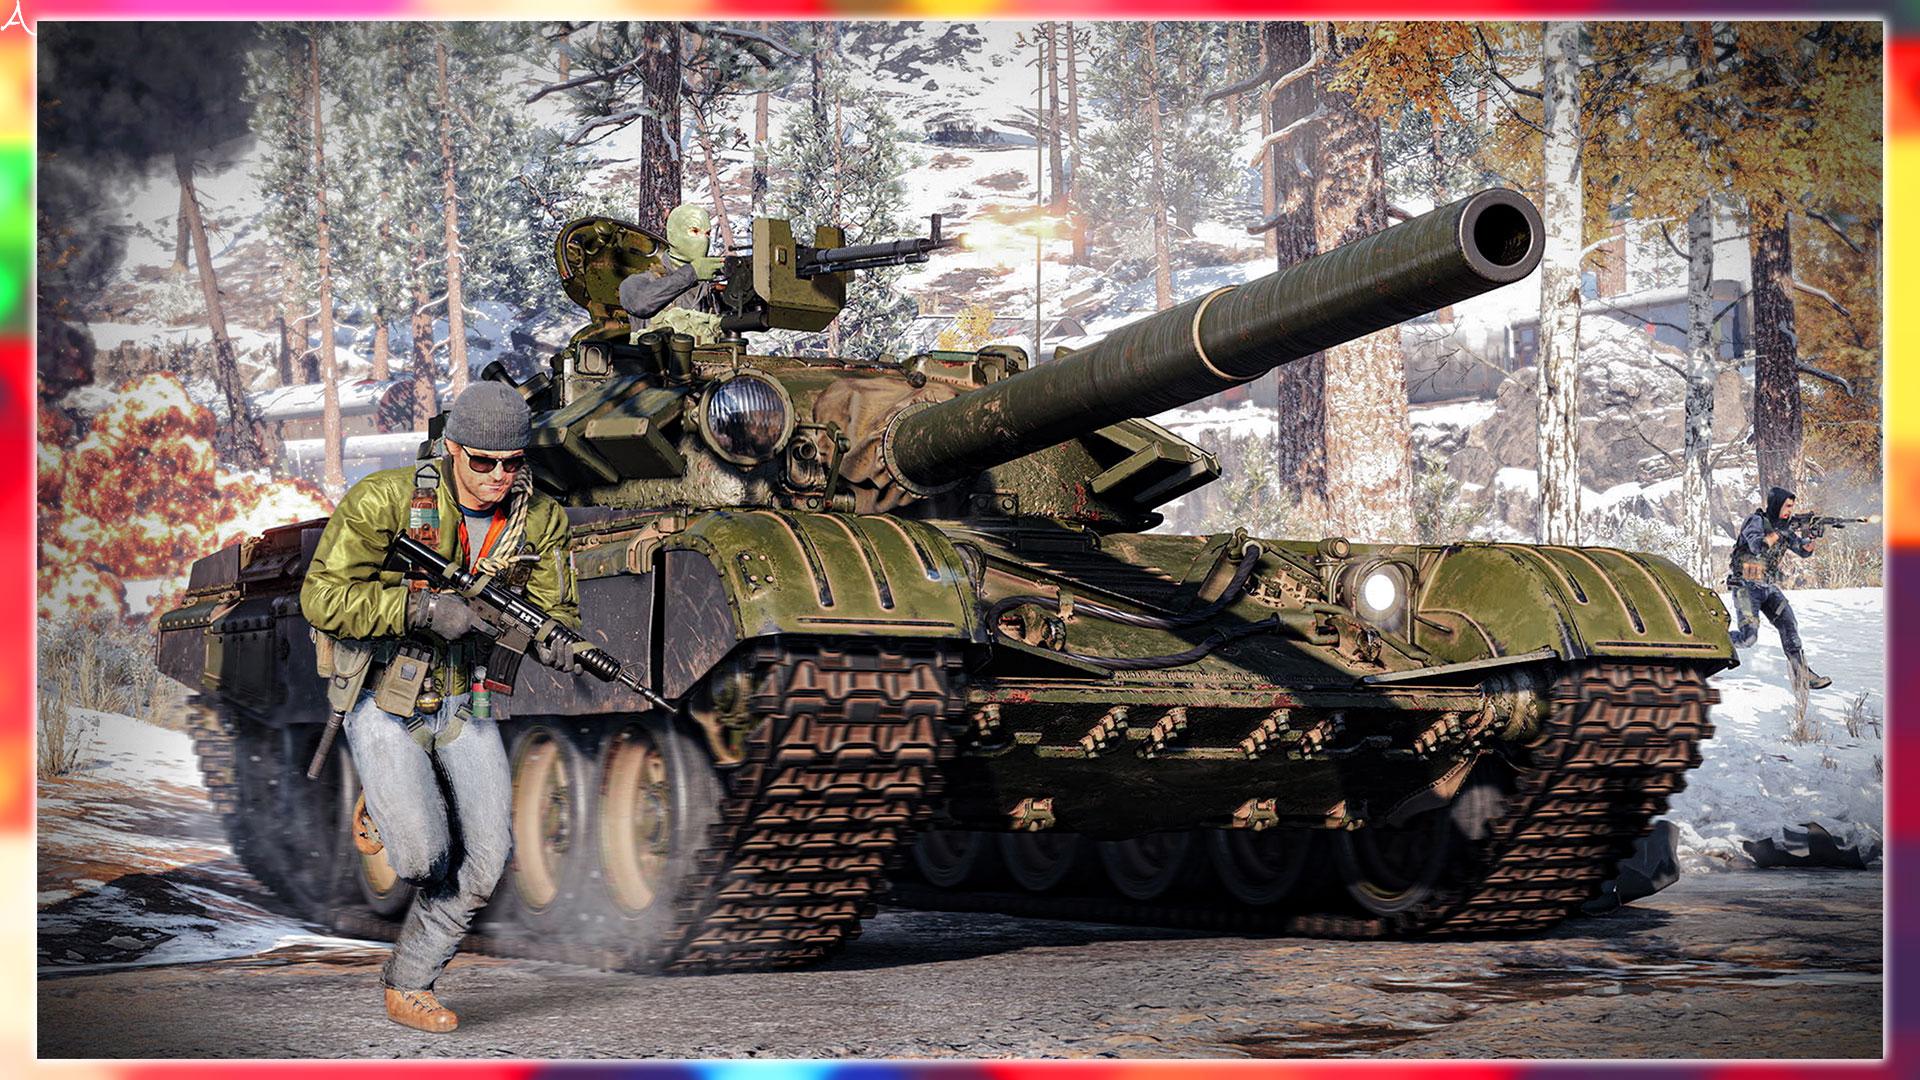 PC版「CoD: Black Ops Cold War」(CoD:BOCW)ベータ版に必要な最低/推奨スペックを確認